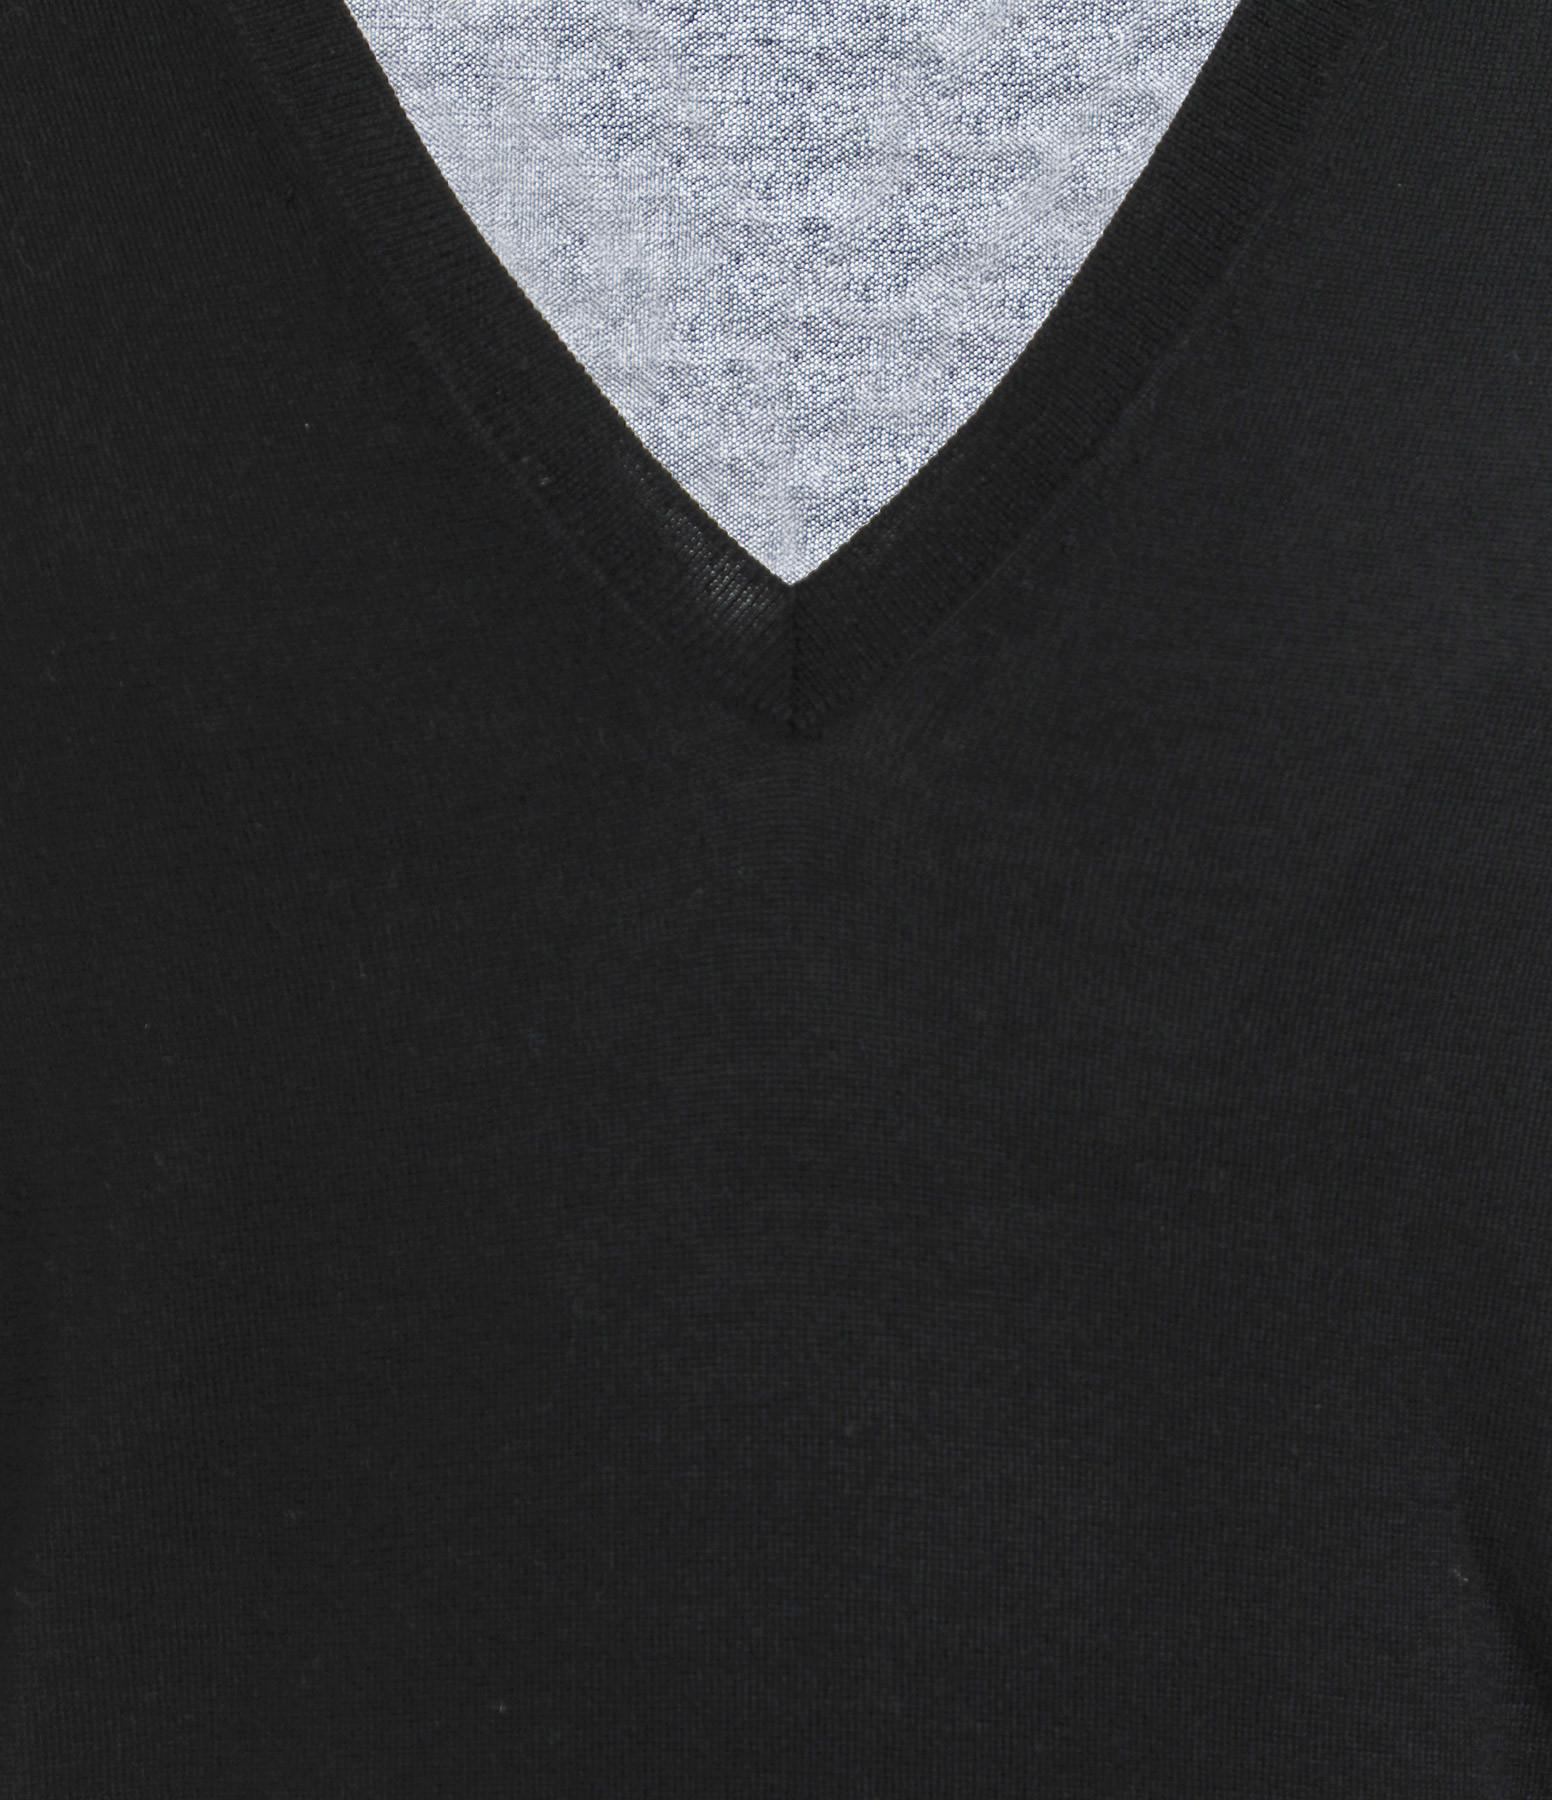 ERIC BOMPARD - Pull V Ultrafin Contemporain Noir